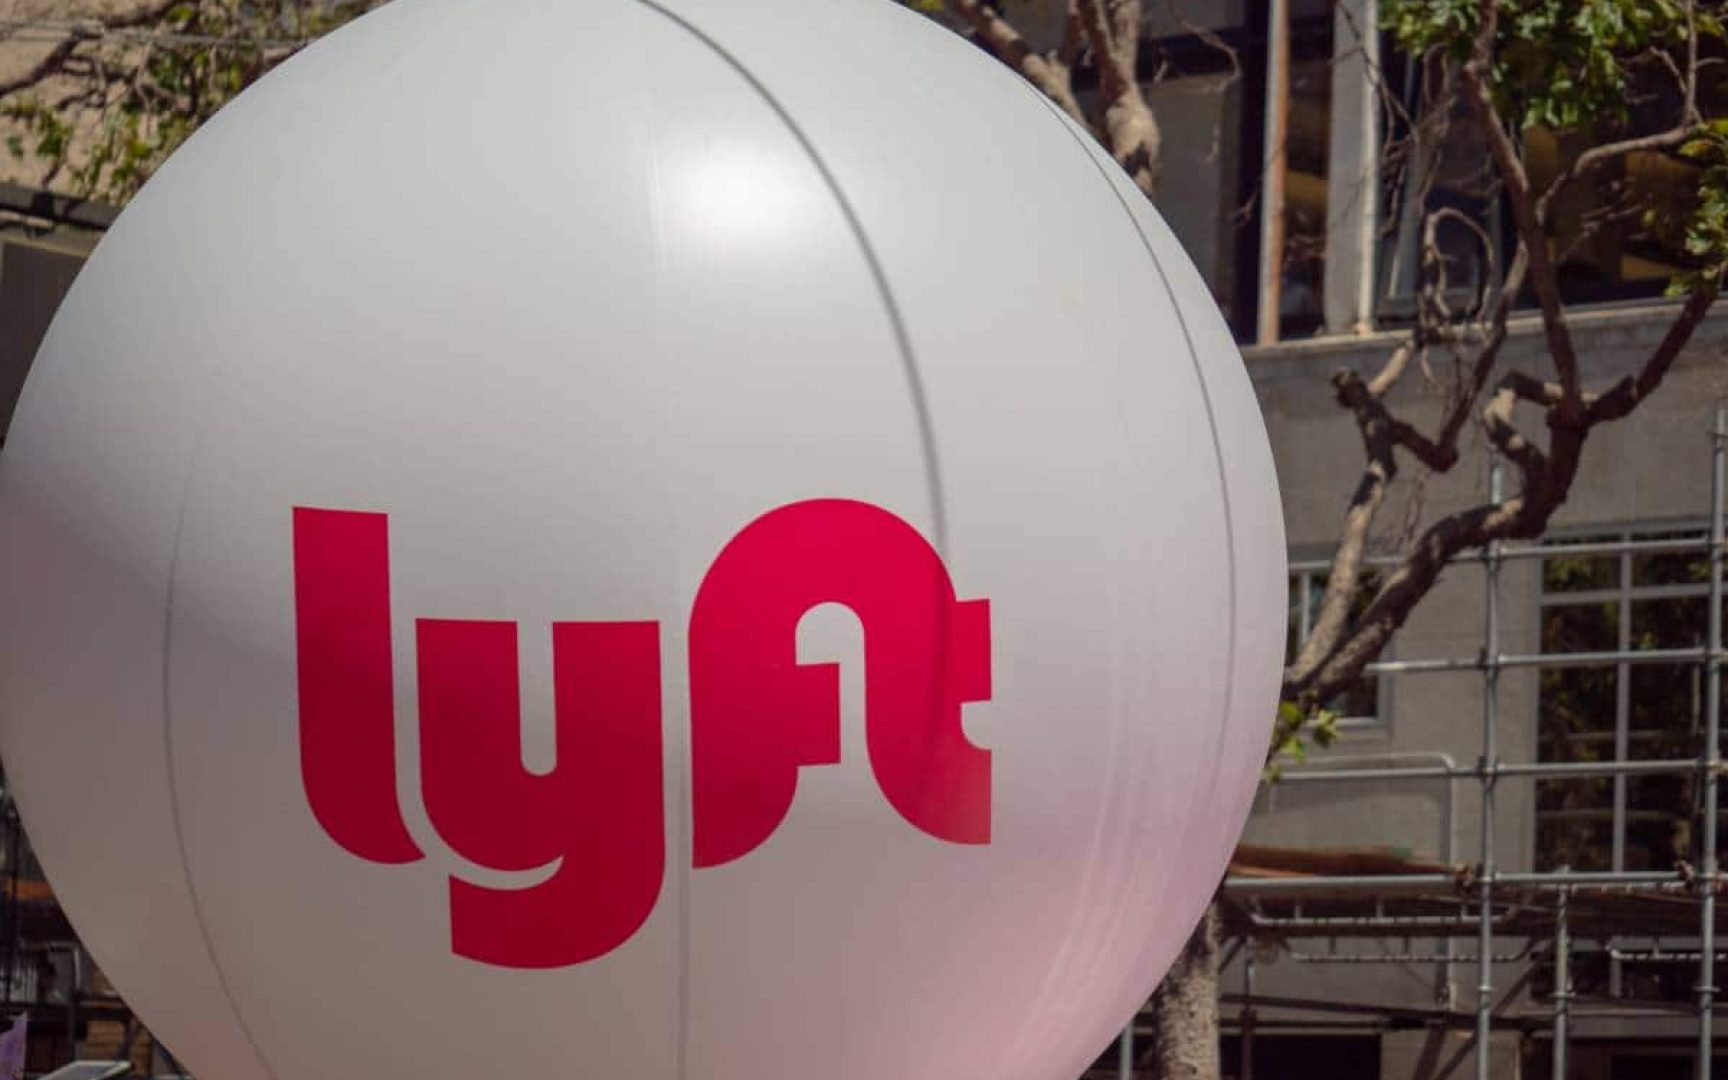 Lyft logo on a large balloon